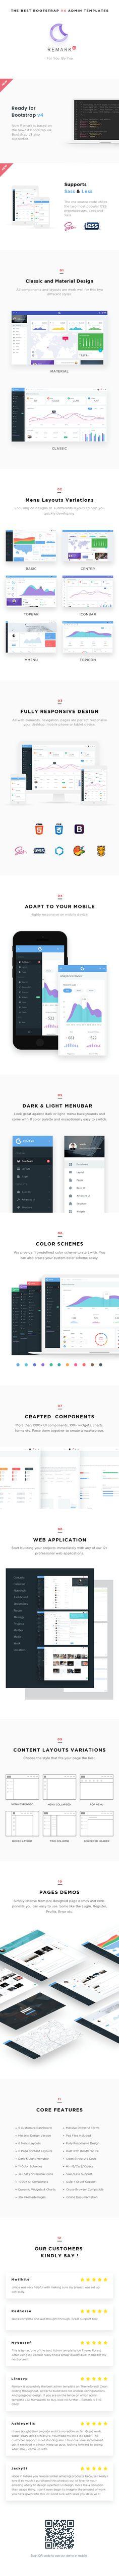 Dream Admin Template | Free Bootstrap Admin Templates | Pinterest